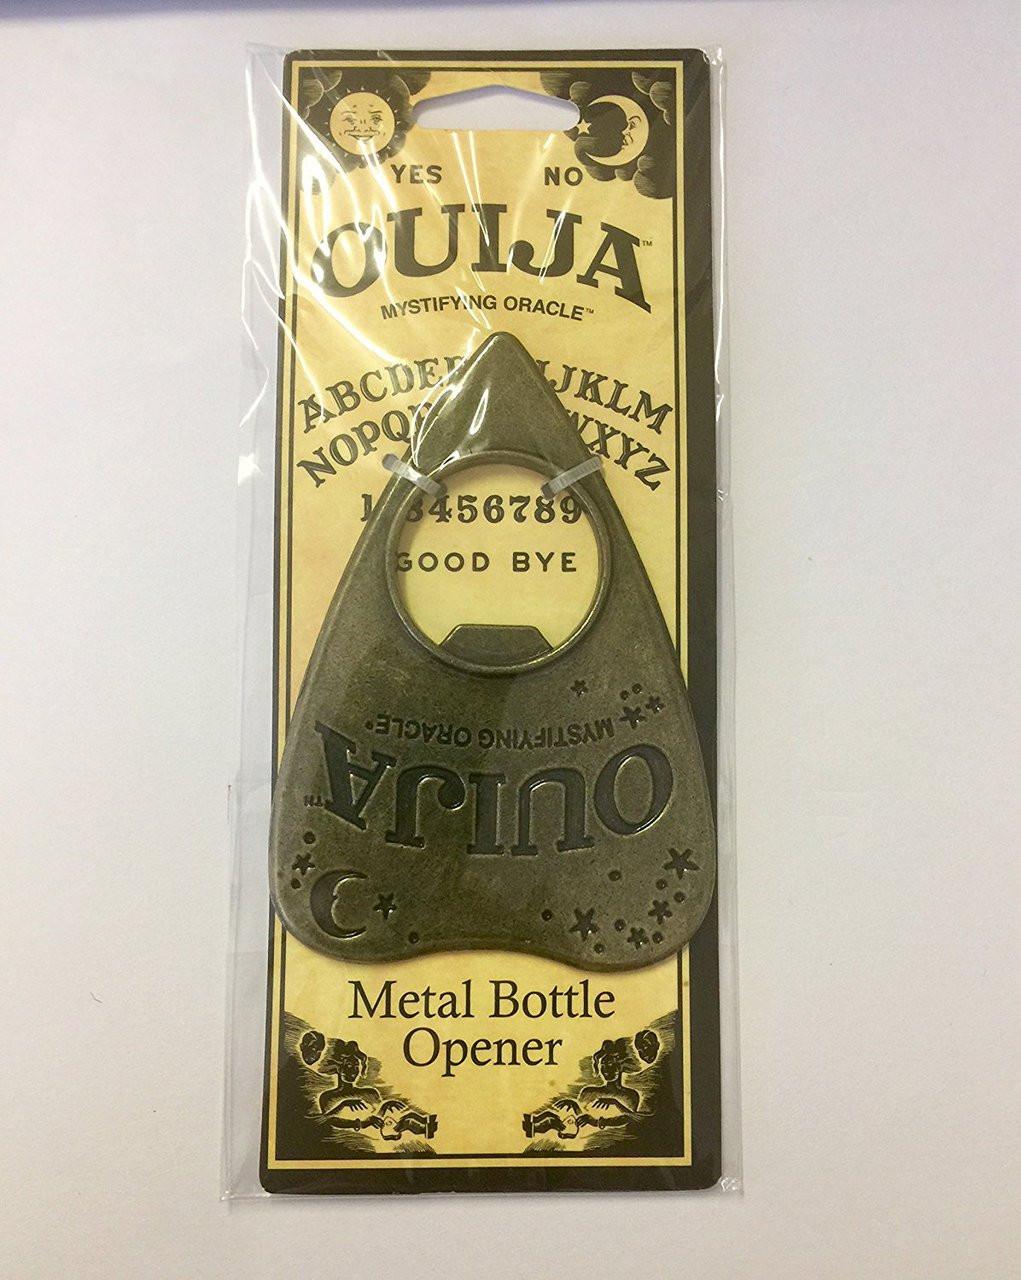 http://store-svx5q.mybigcommerce.com/product_images/web/674449389233.jpg